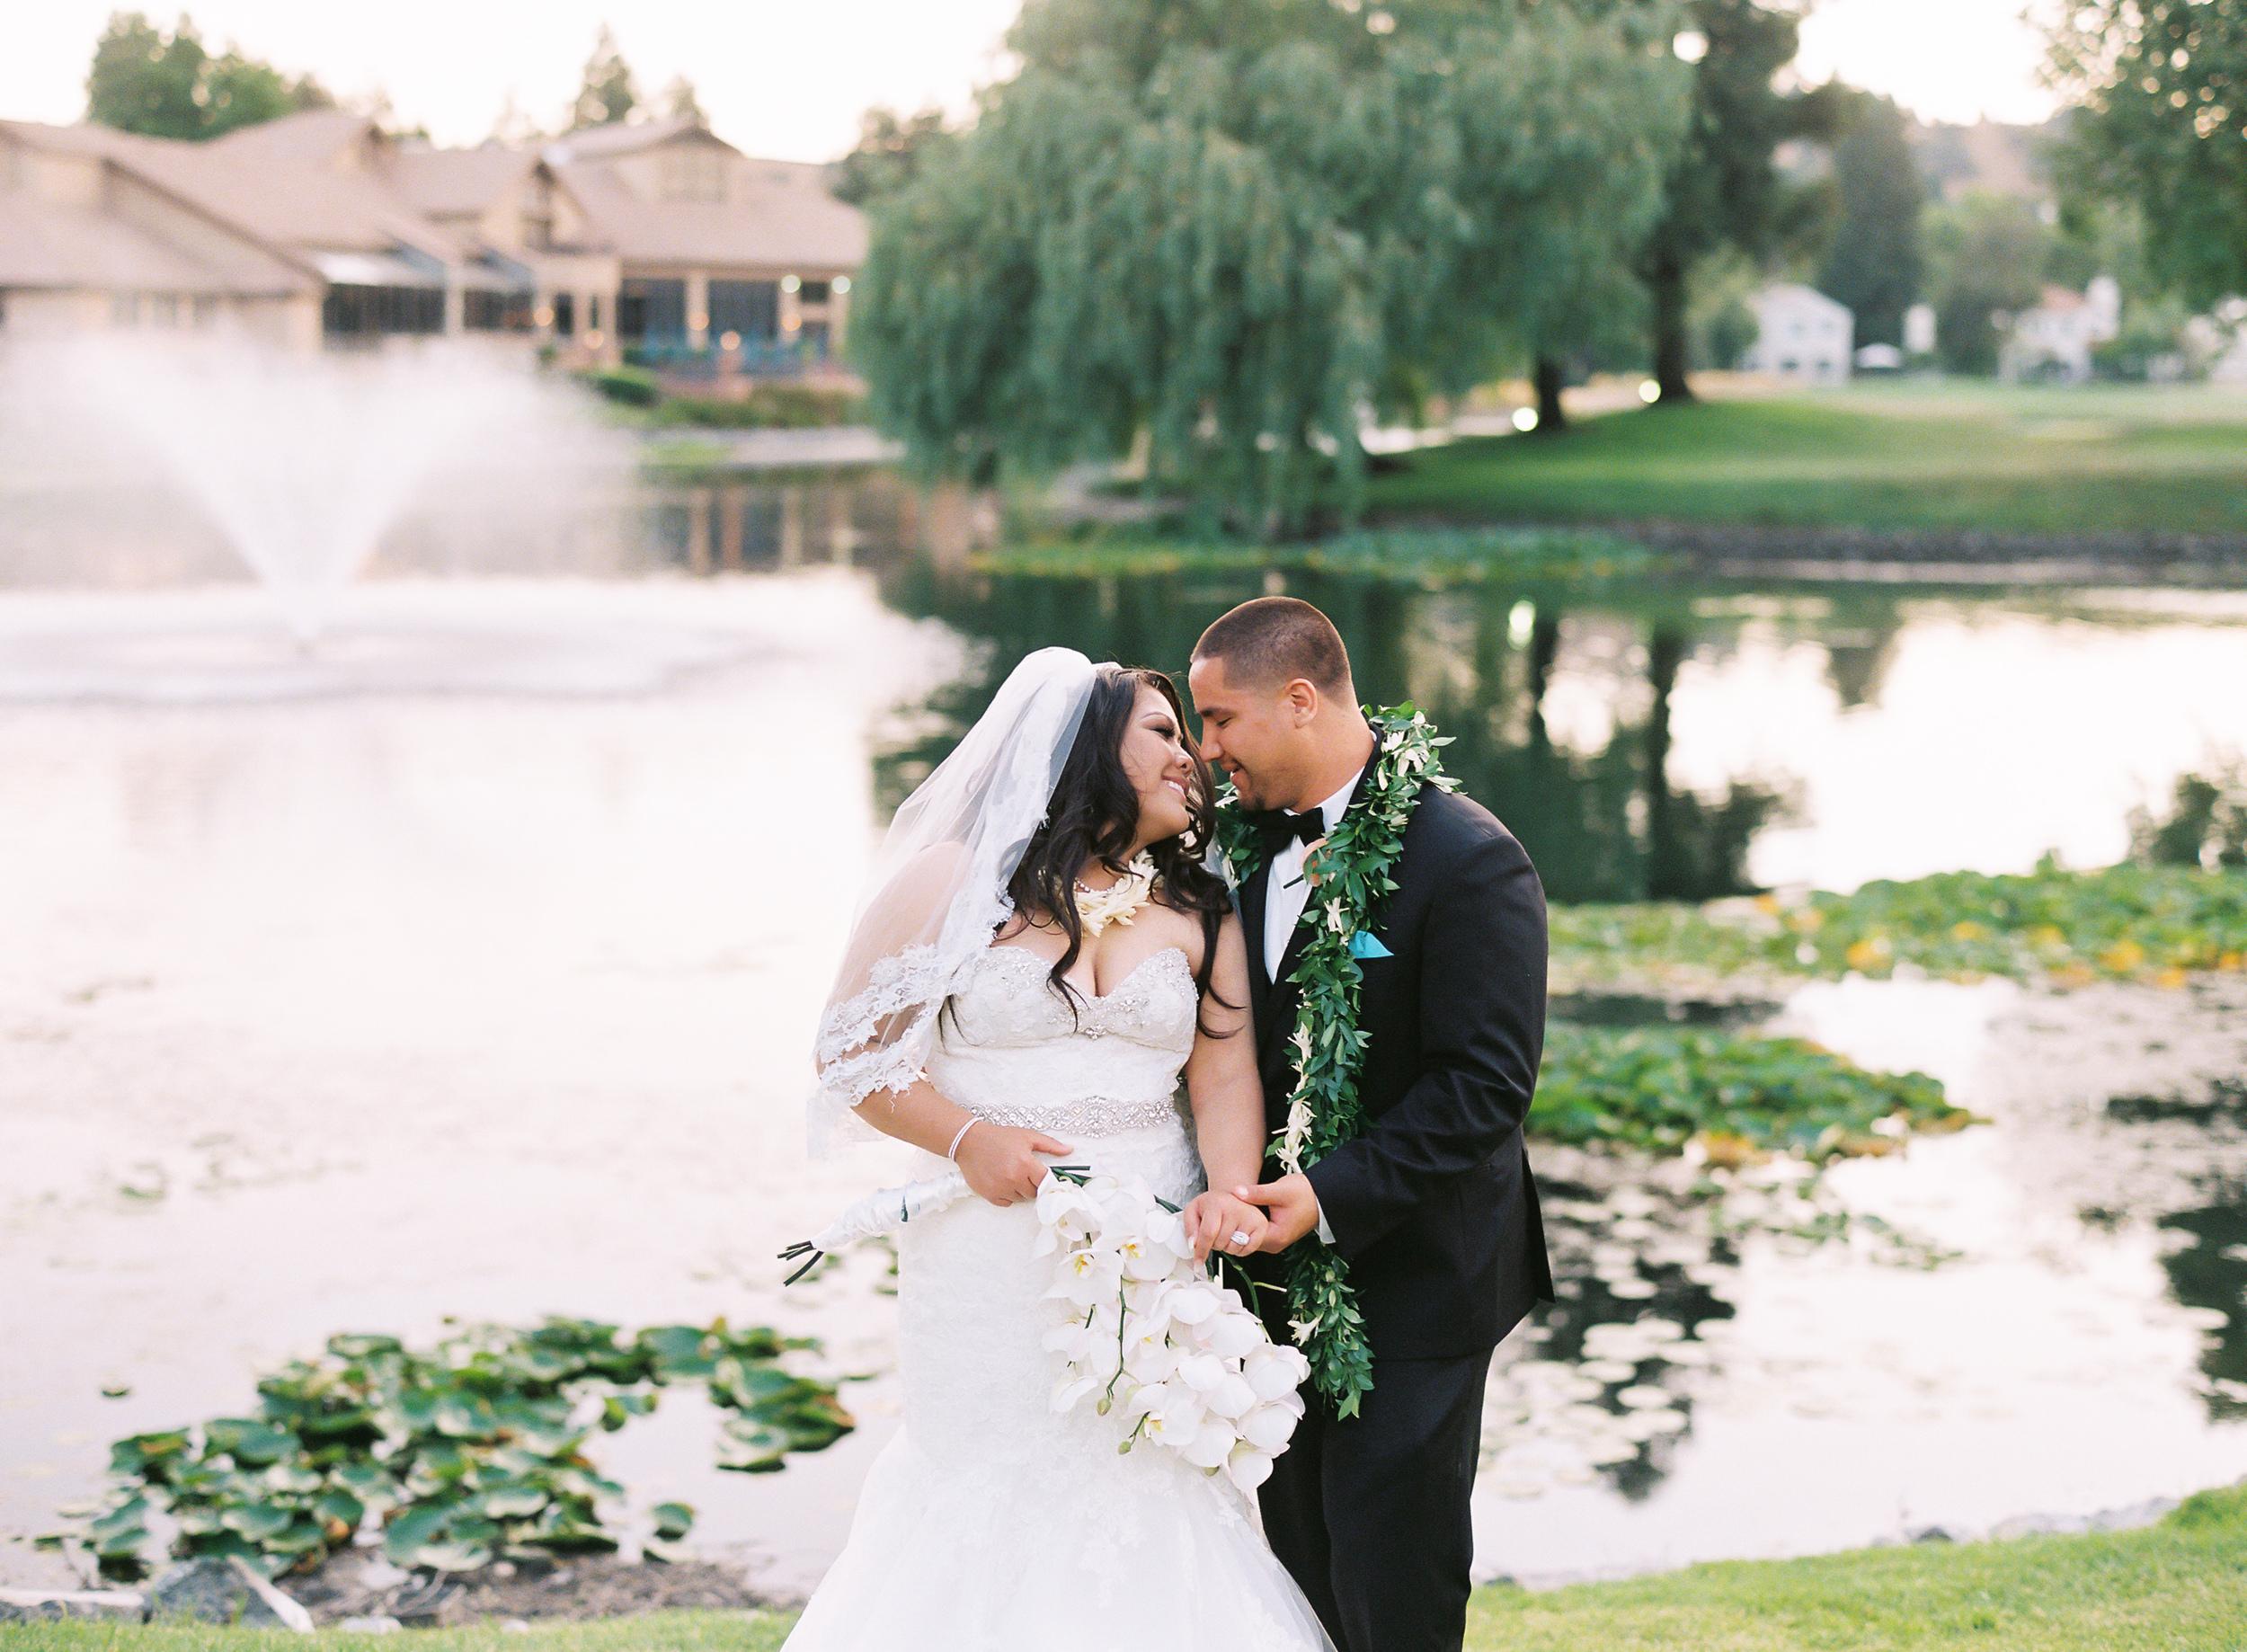 hawaiian-inspired-wedding-at-blackhawk-country-club-003.jpg